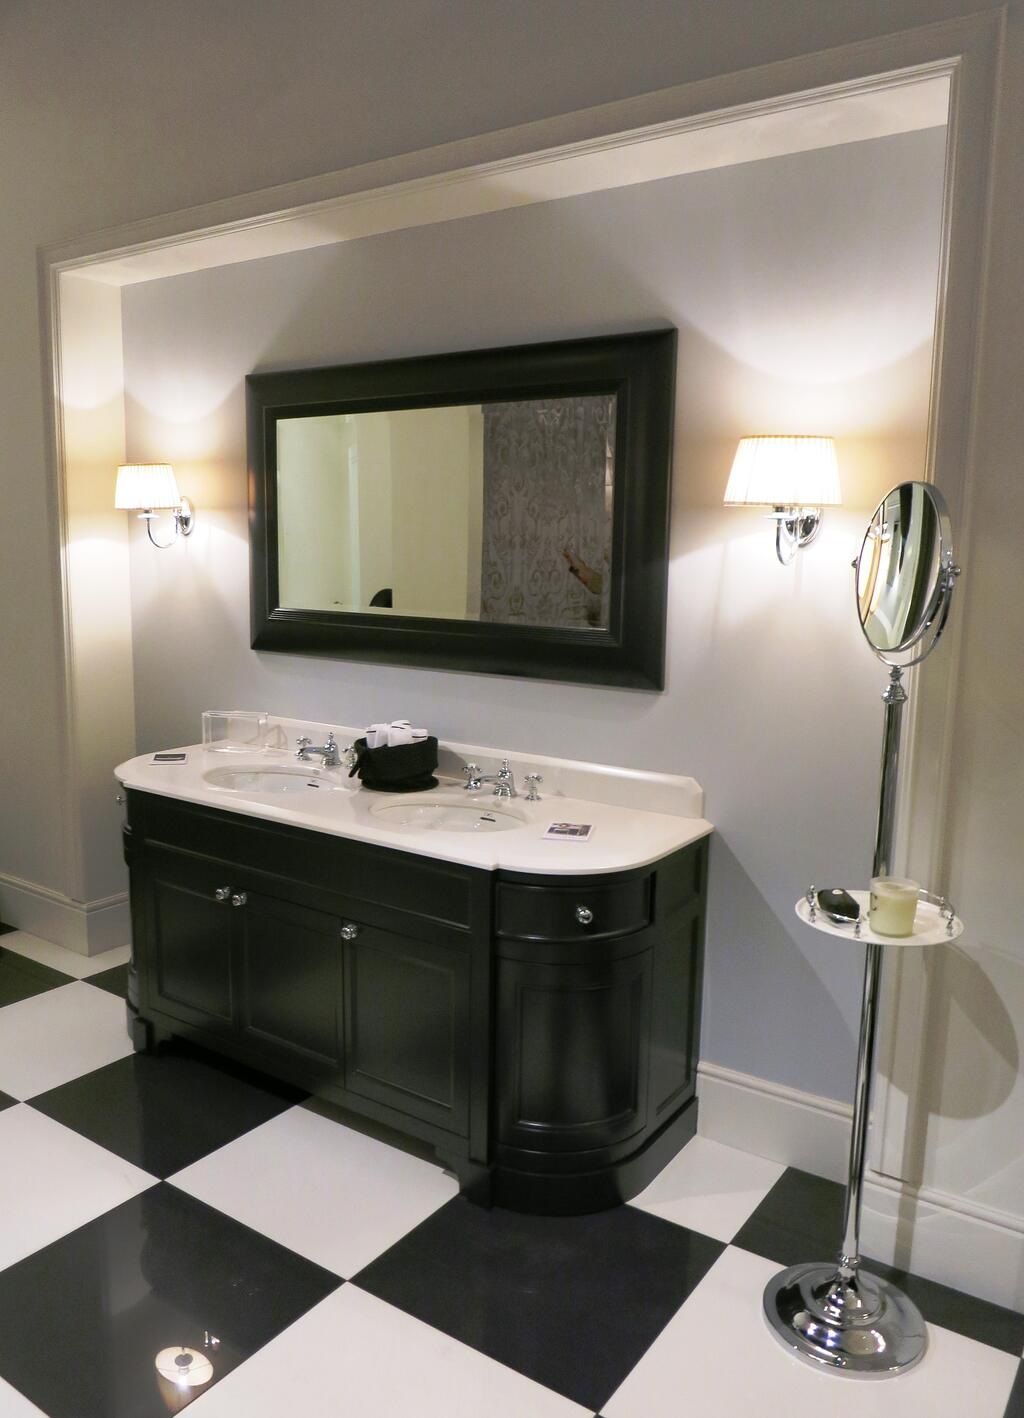 Future Trends in Bathroom Furnishings